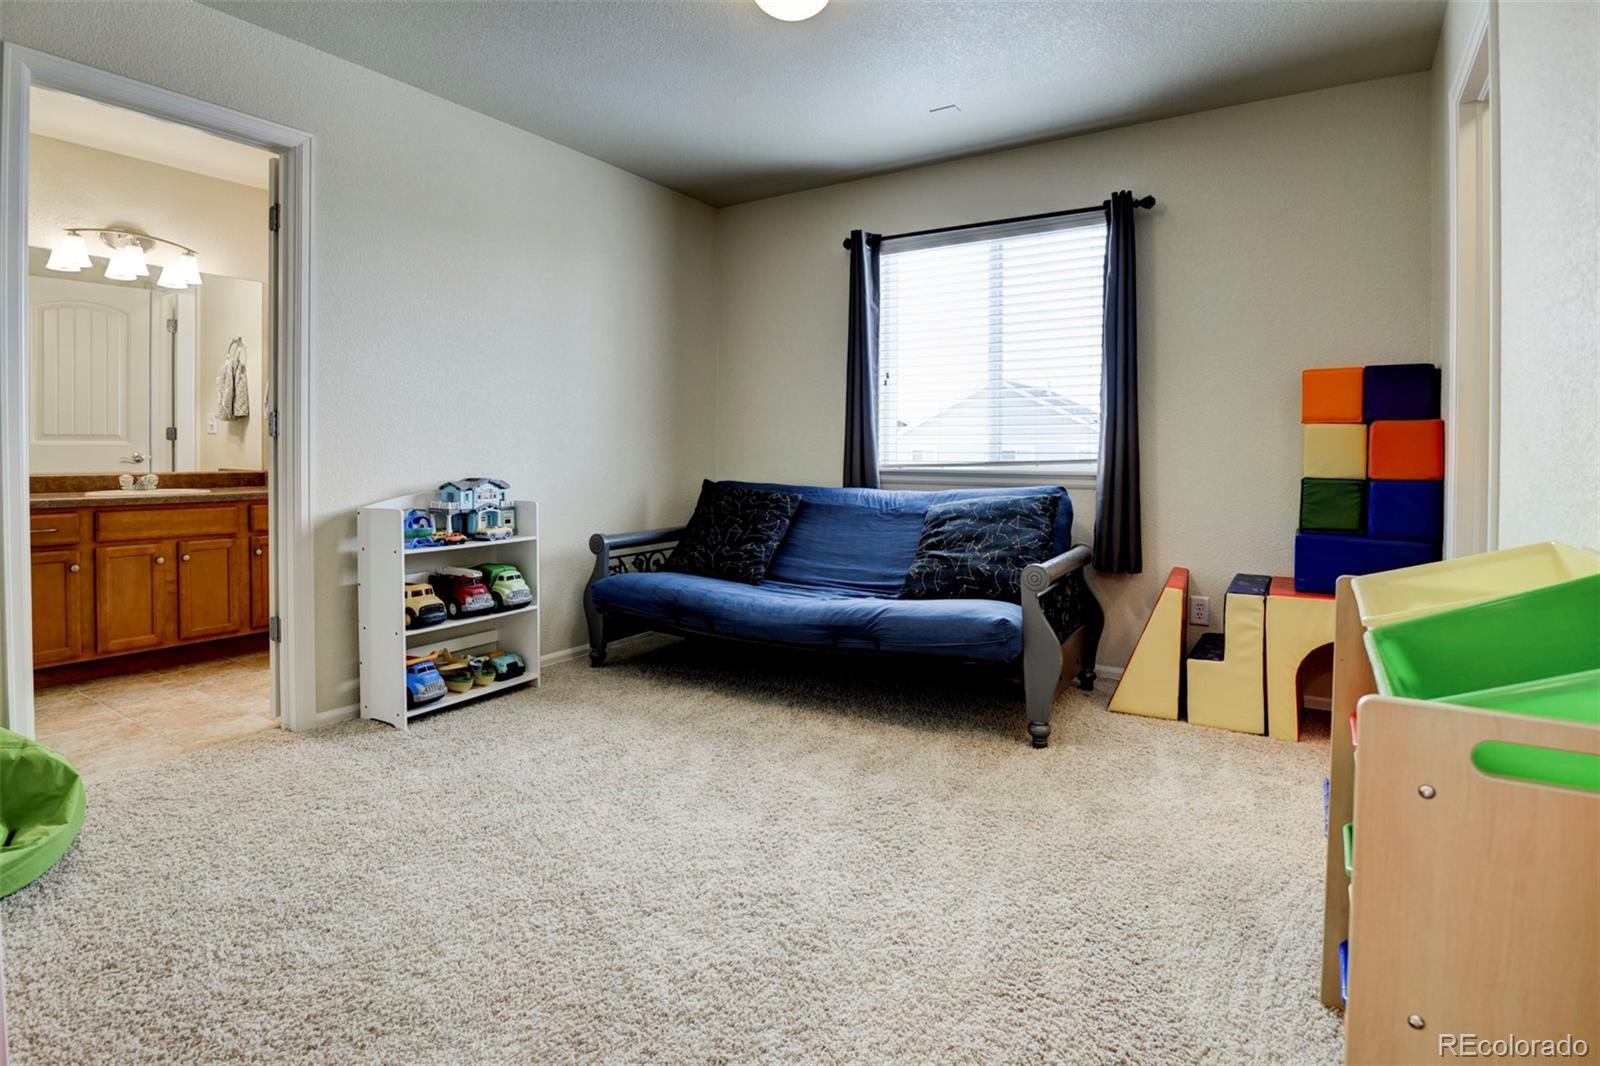 MLS# 7612924 - 20 - 6139 Rocking Chair Lane, Colorado Springs, CO 80925